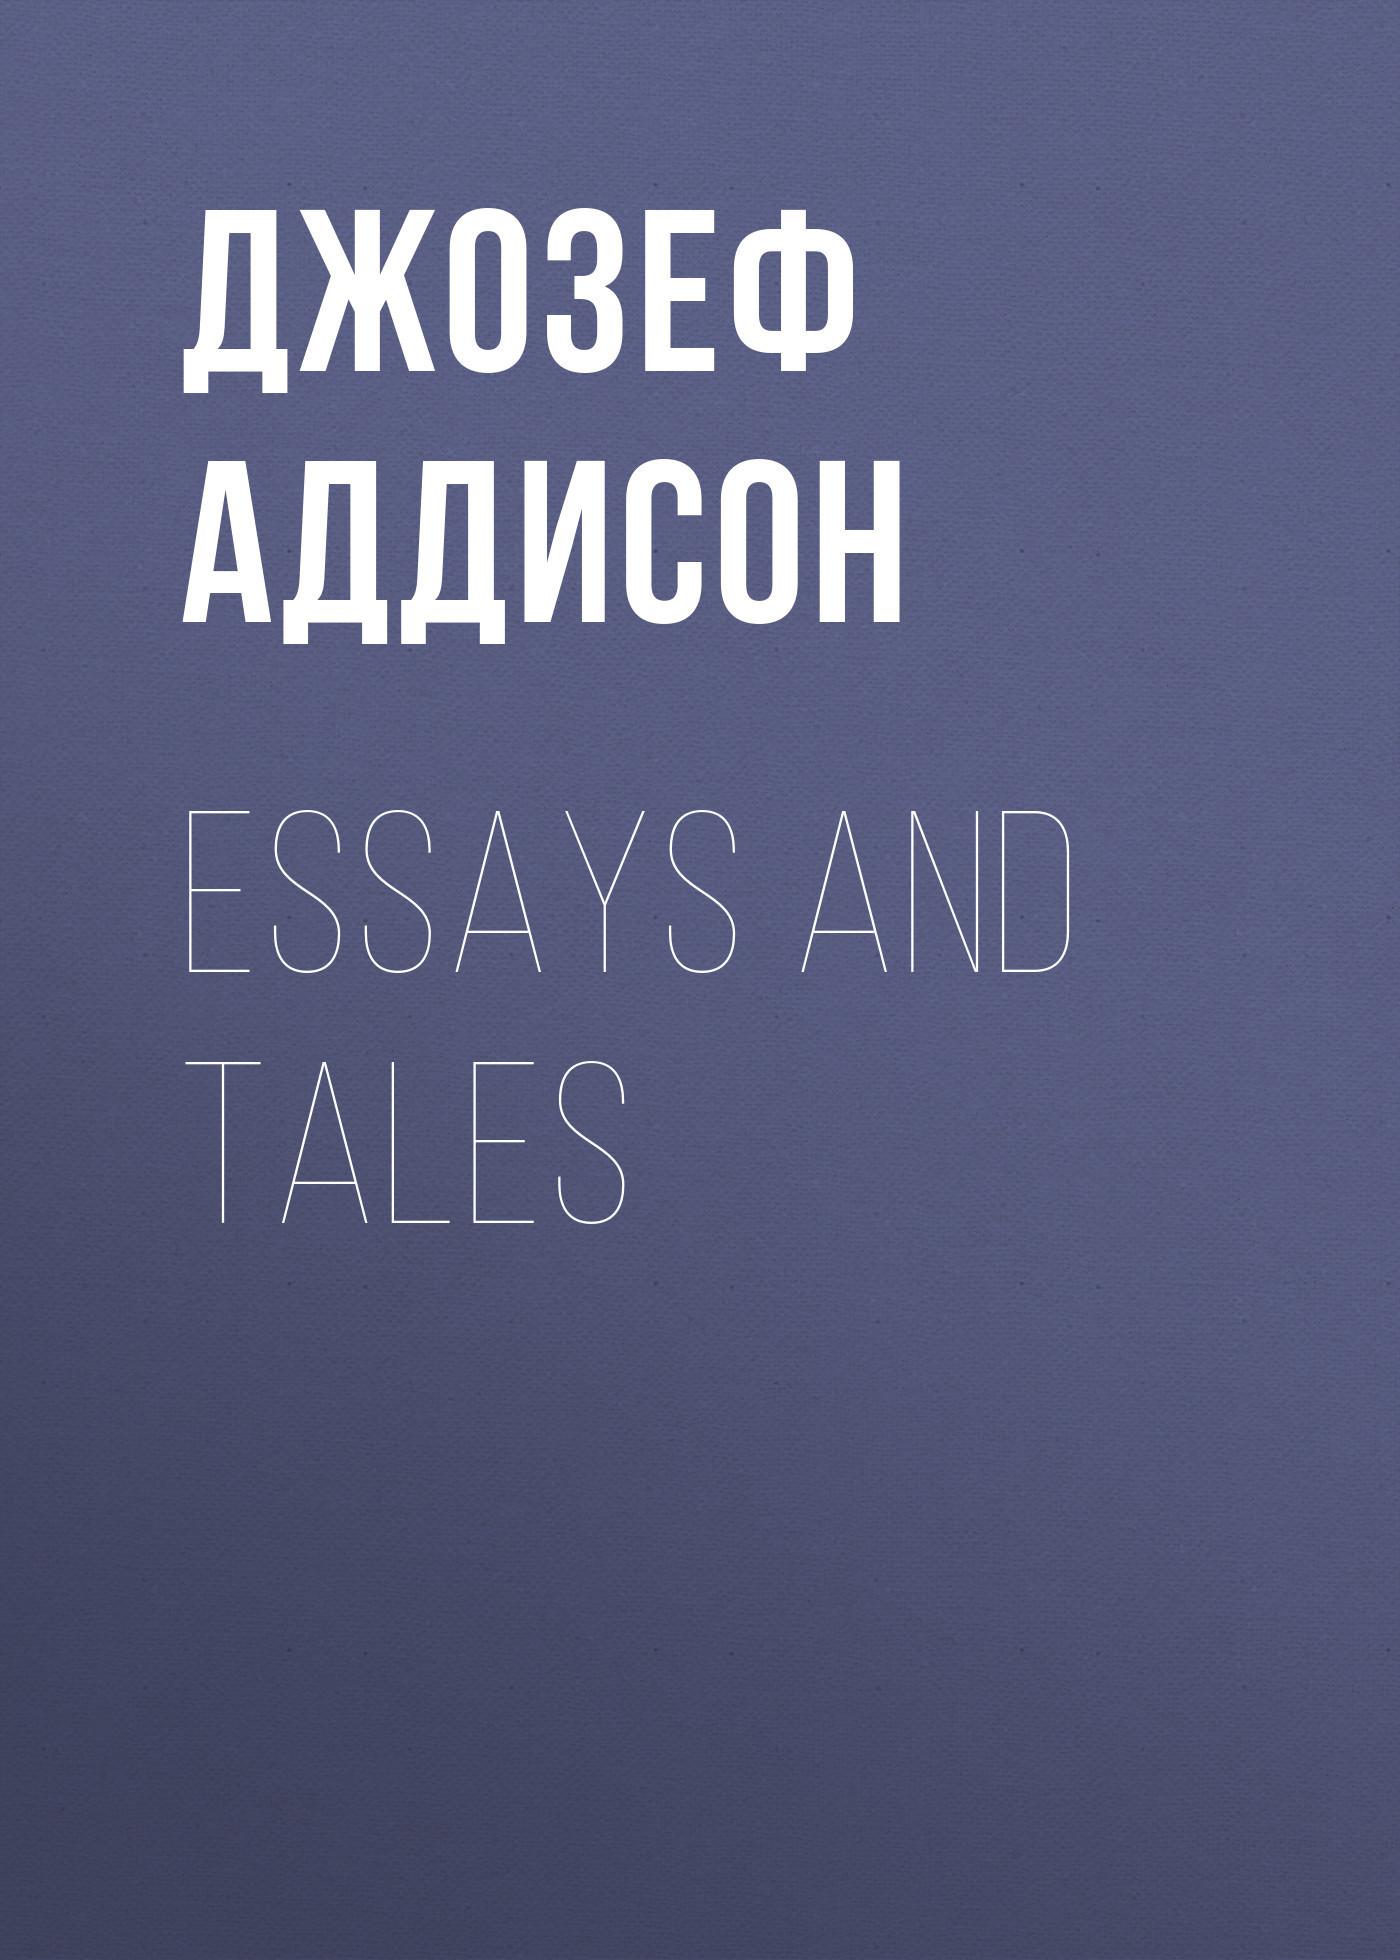 Джозеф Аддисон Essays and Tales